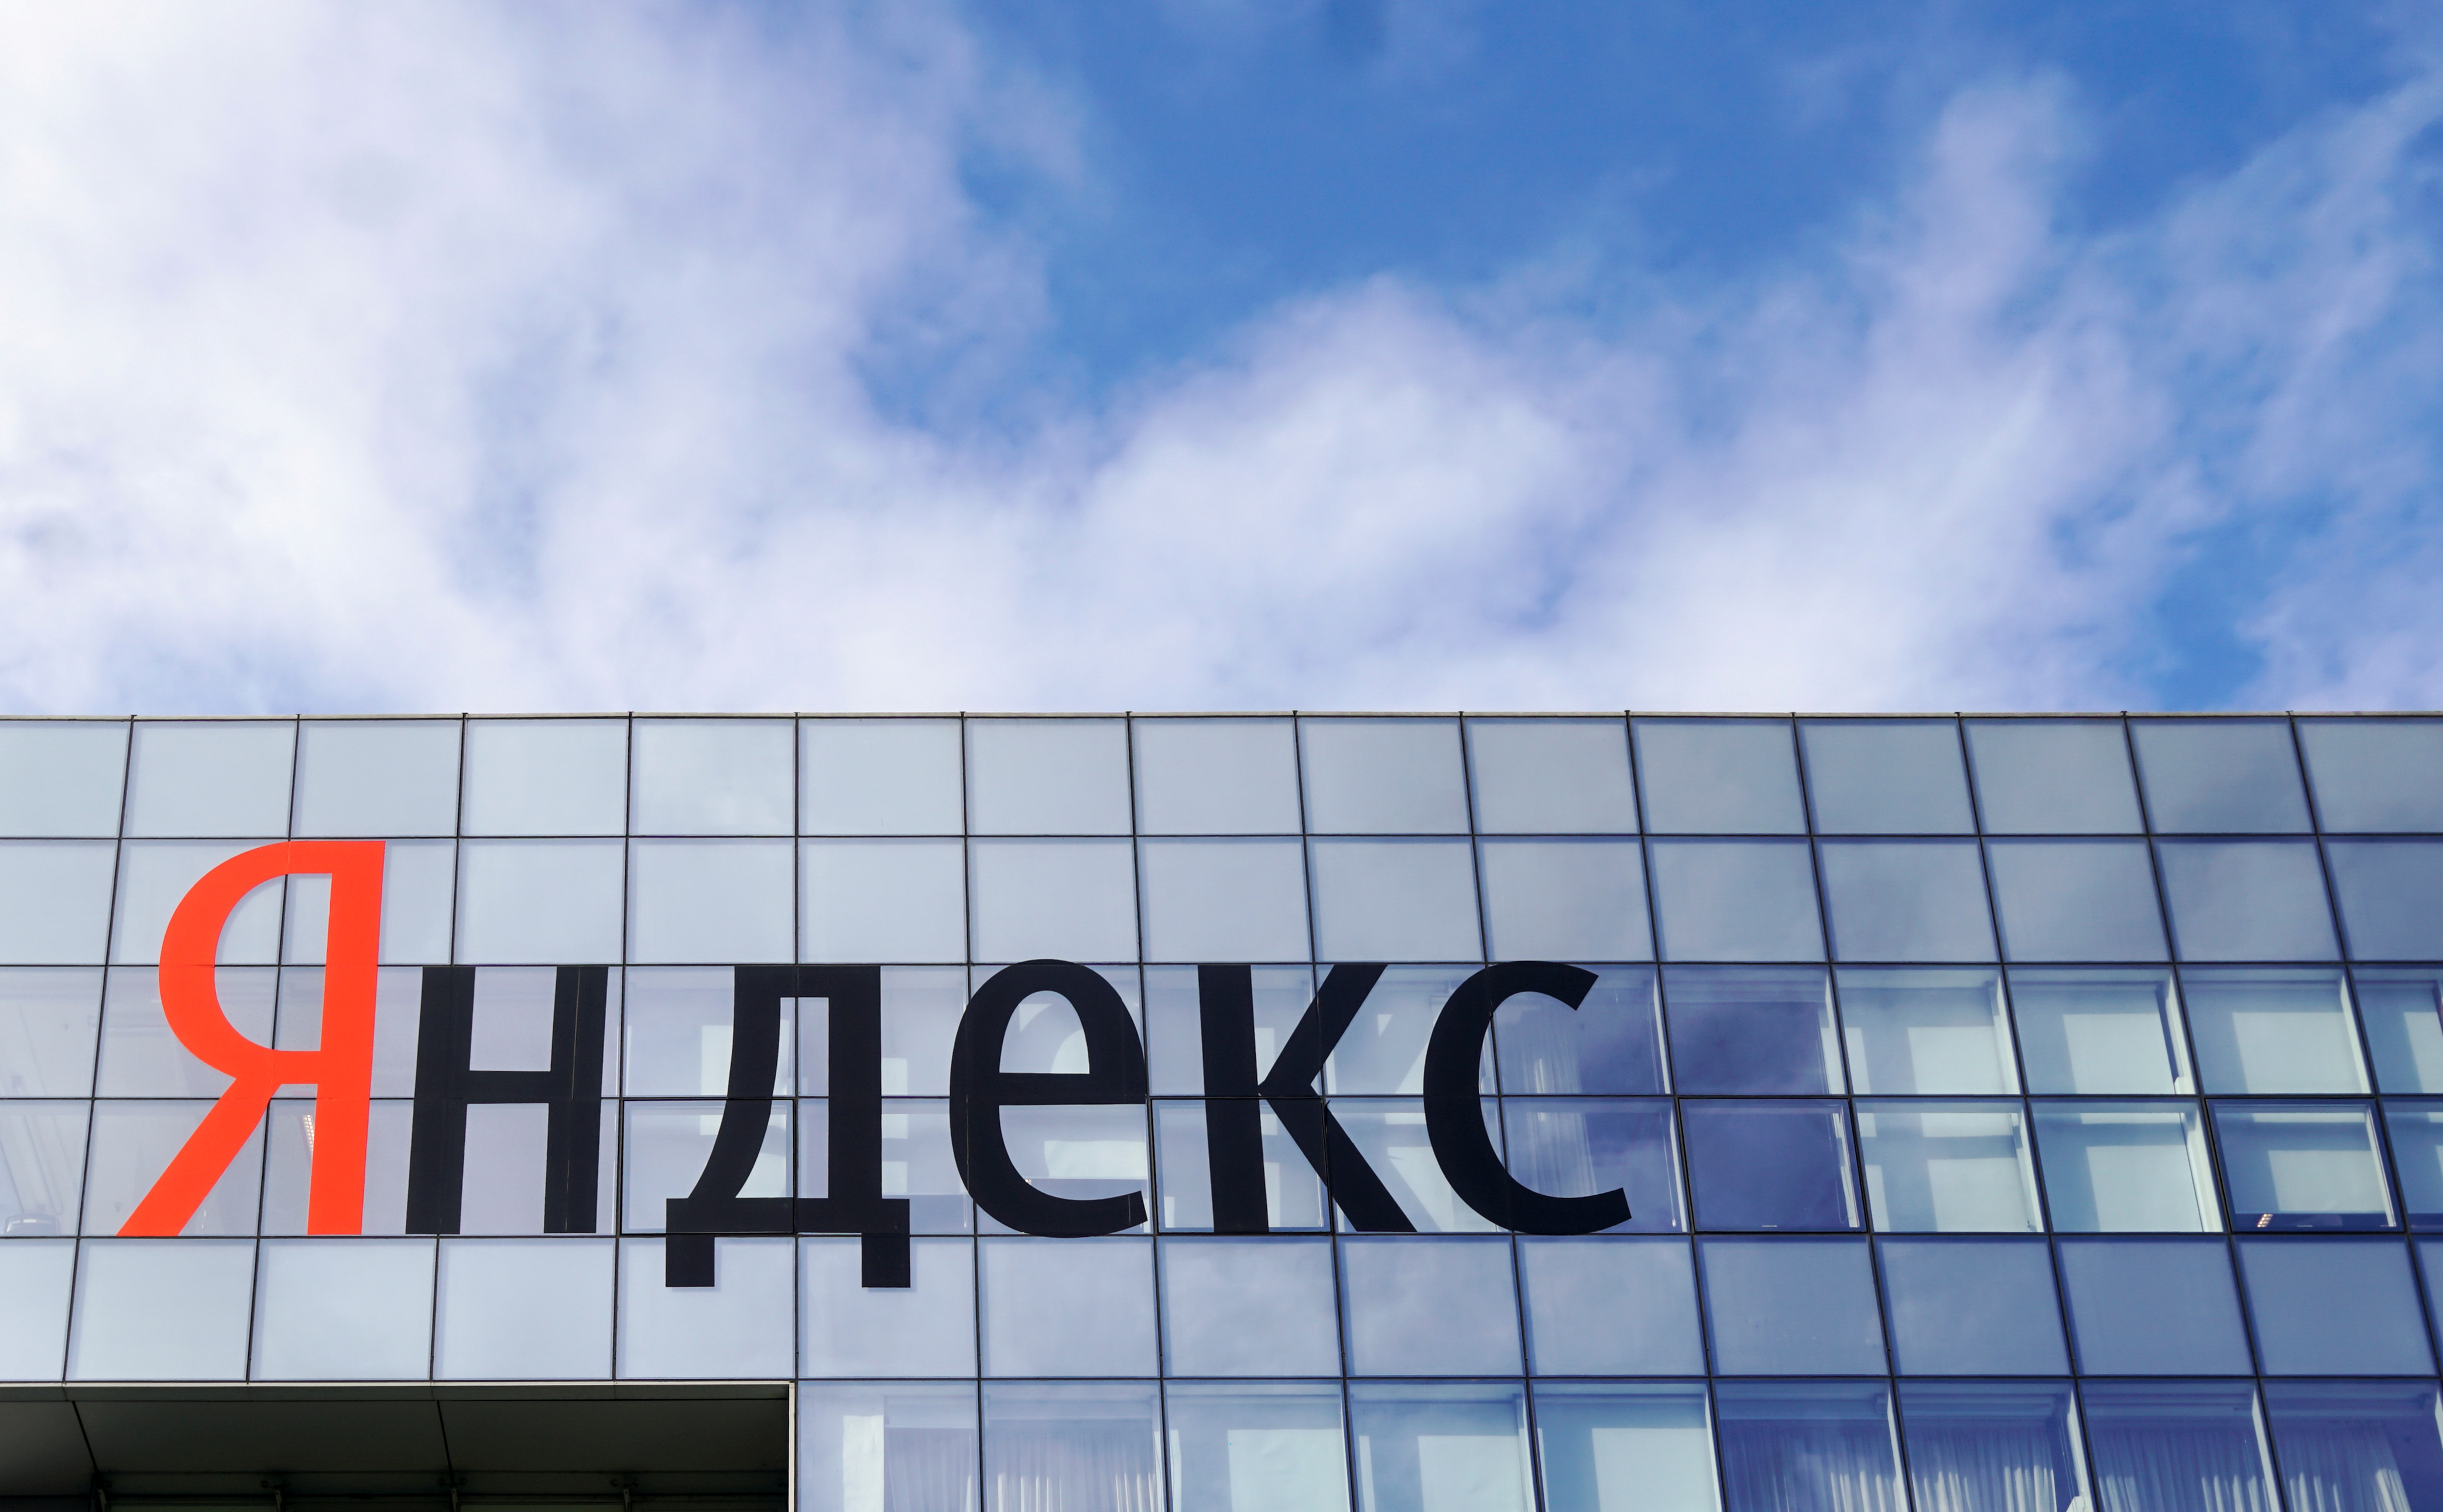 Western intelligence hacked 'Russia's Google' Yandex to spy